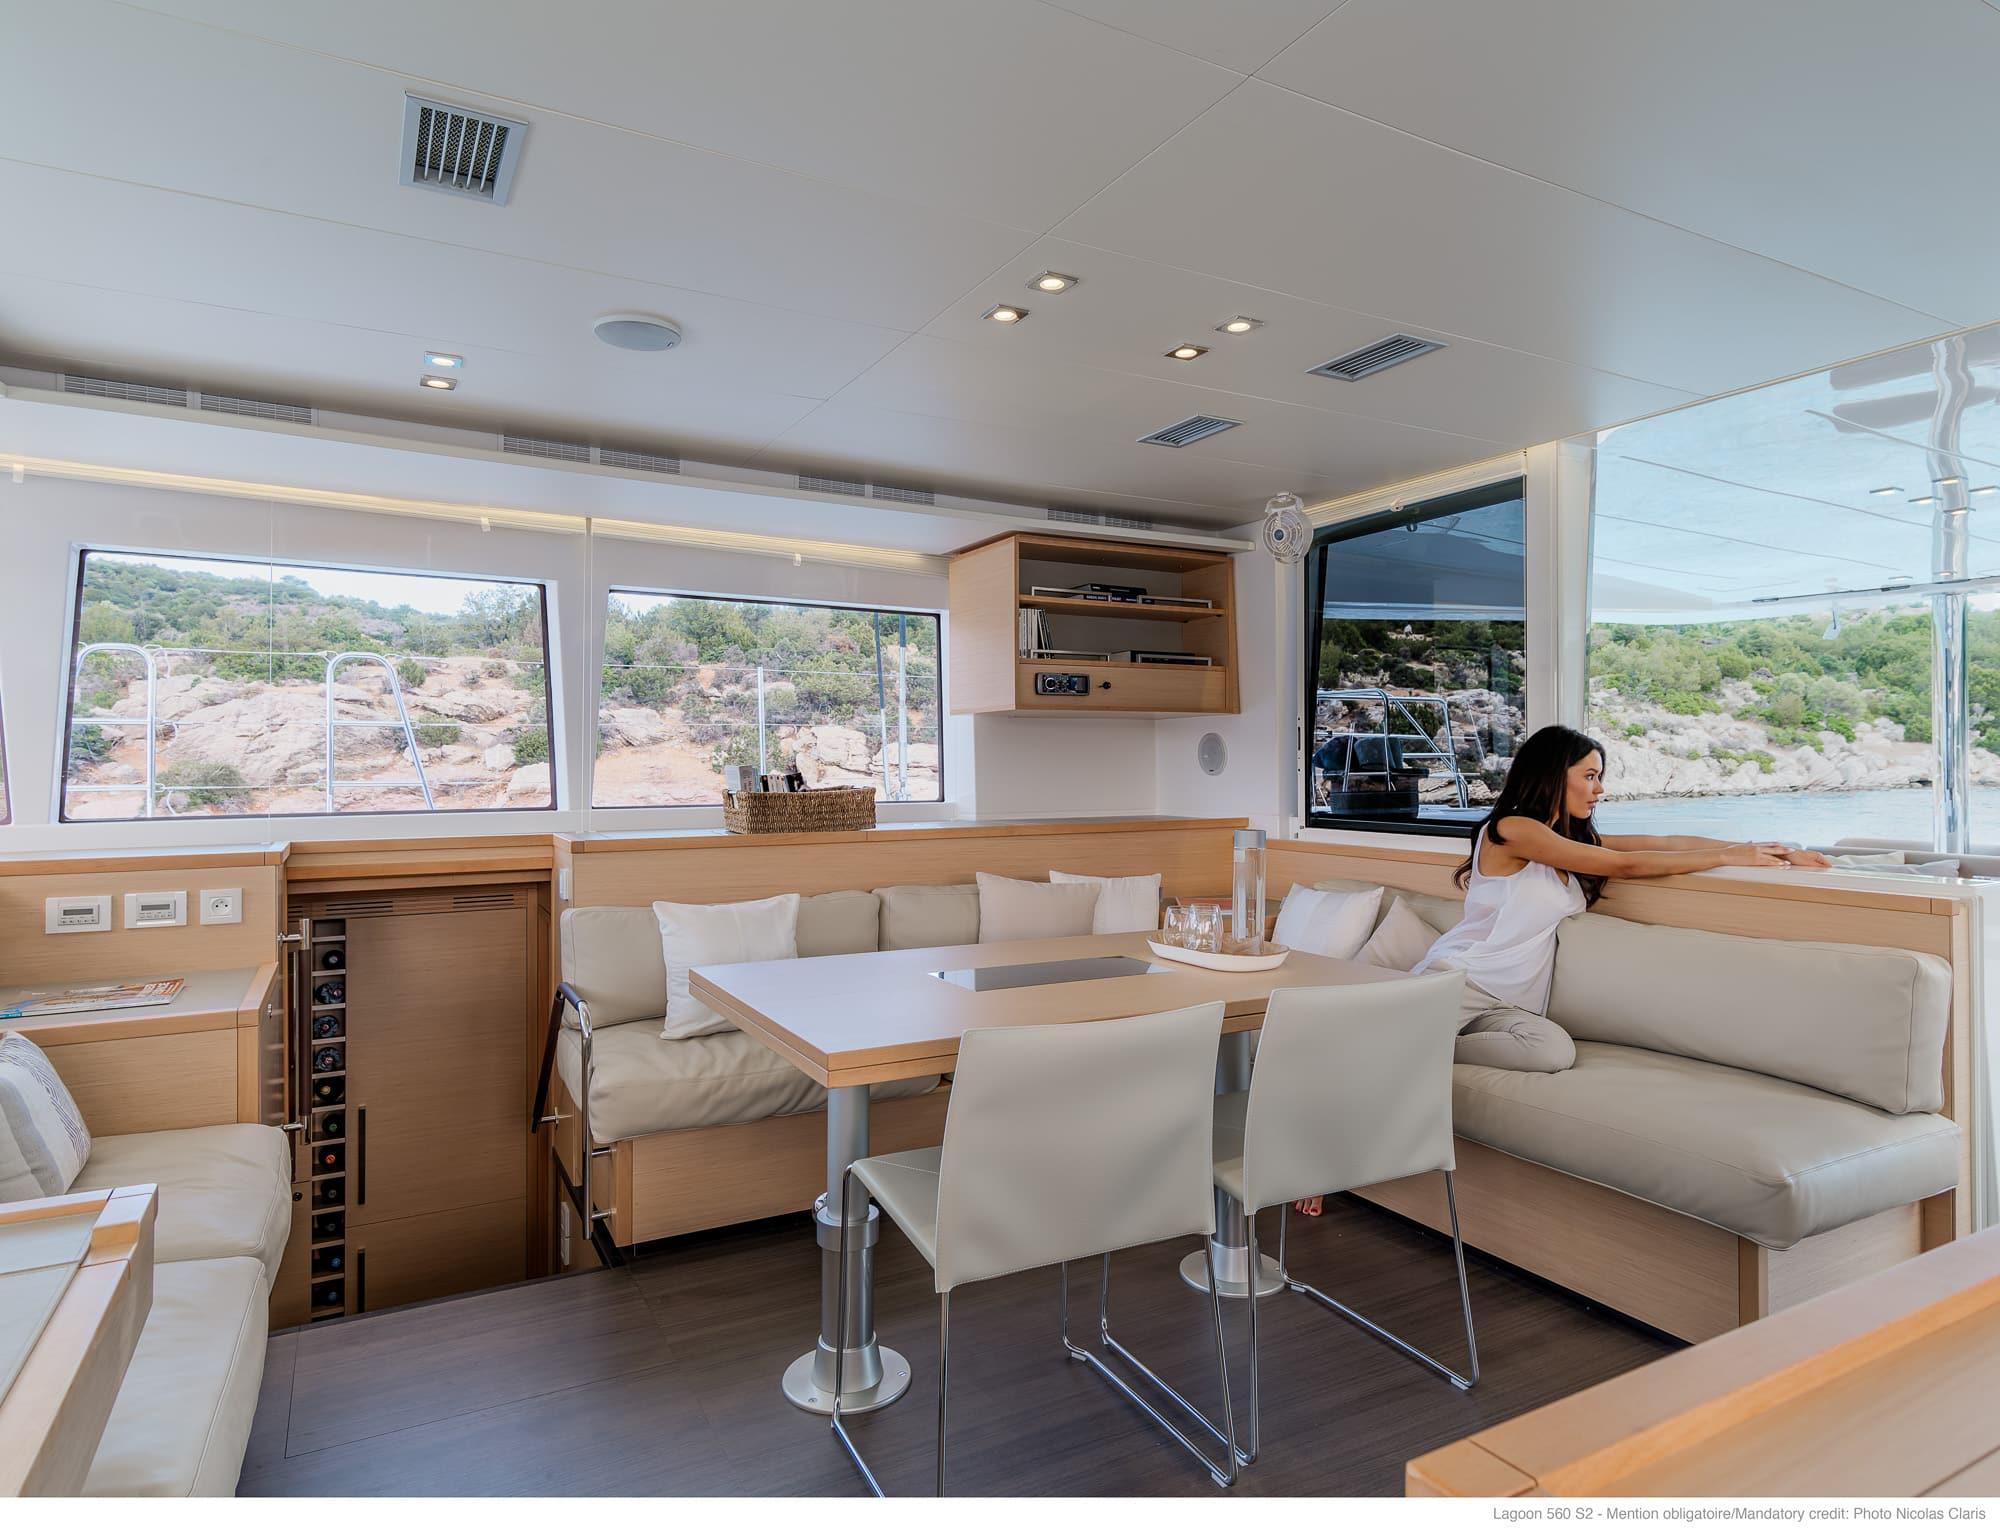 lagoon 560-yacht-charter-croatia-sailing-holidays-croatia-booking-yacht-charter-croatia-catamarans-sailboats-motorboats-gulets-luxury-yachts-boat-rental-croatia 12